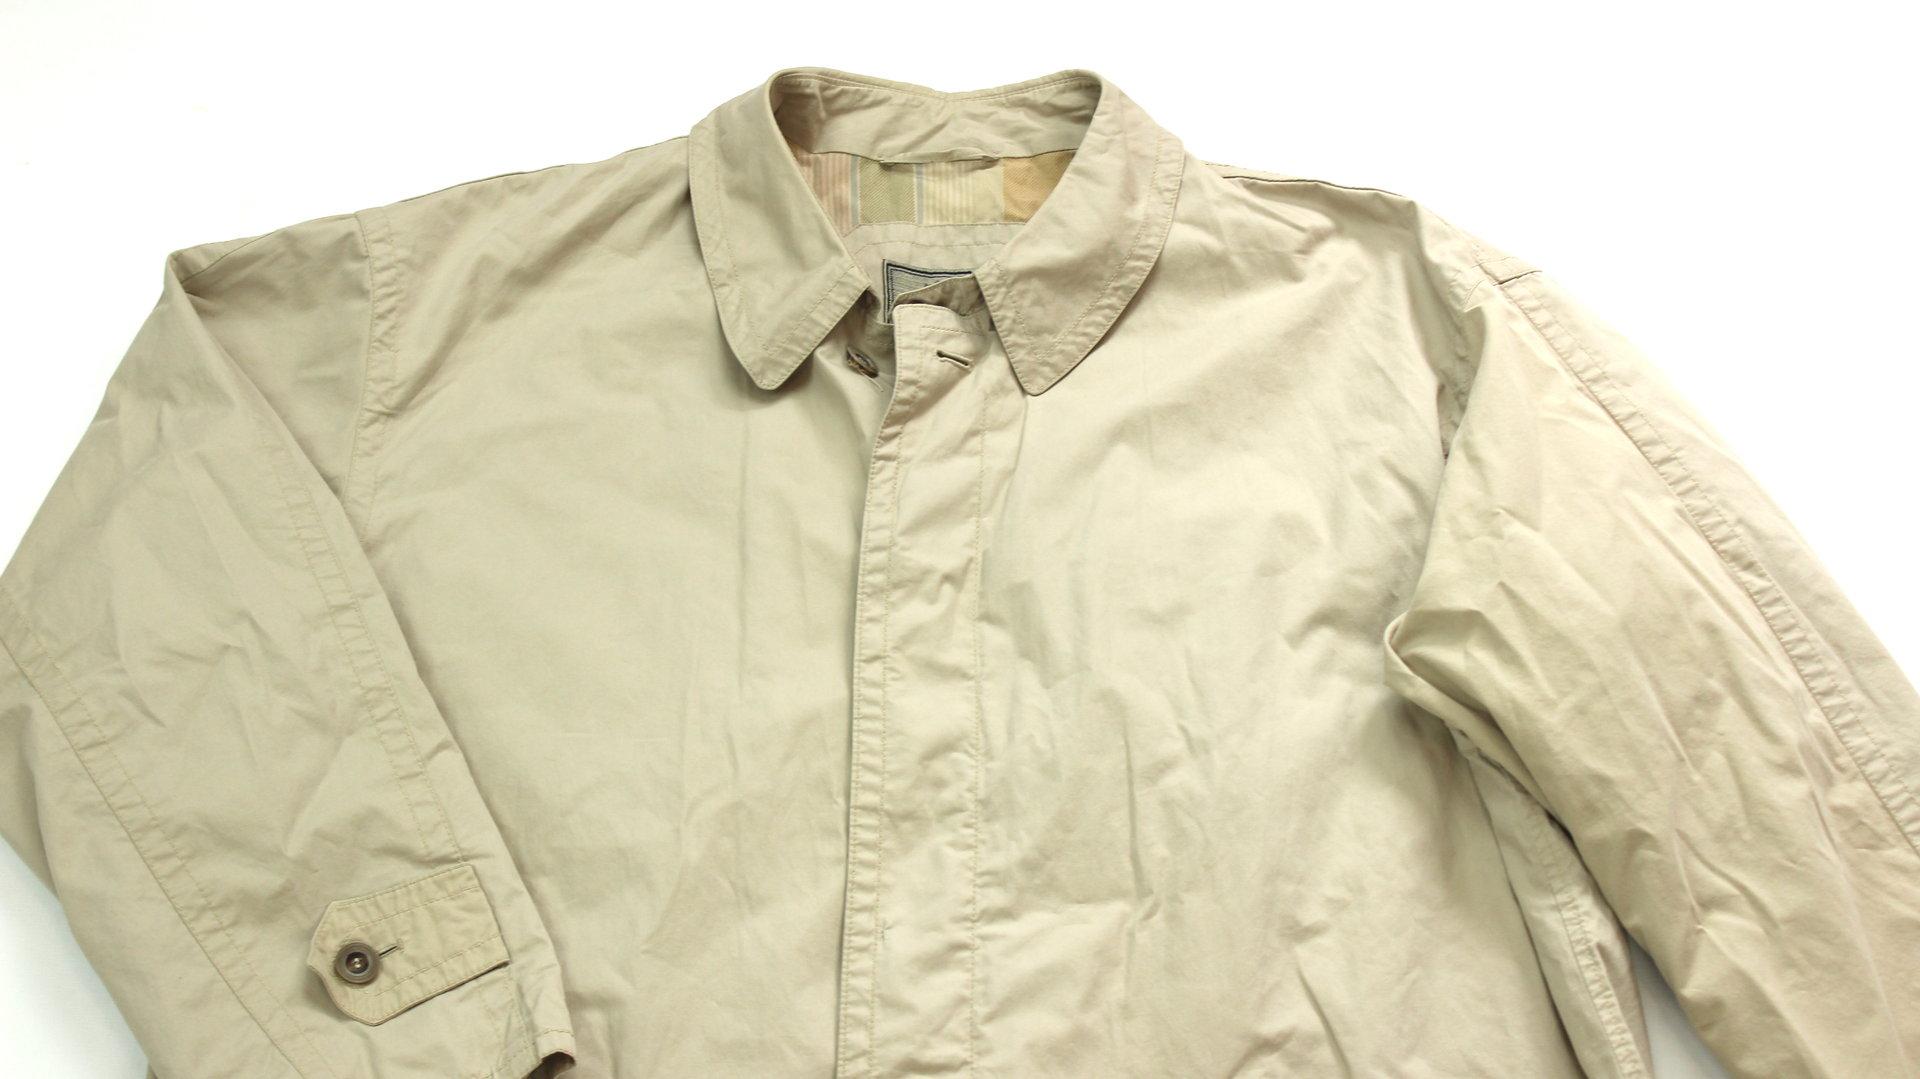 BUGATTI Trenchcoat Sommer Mantel Herren beige 54